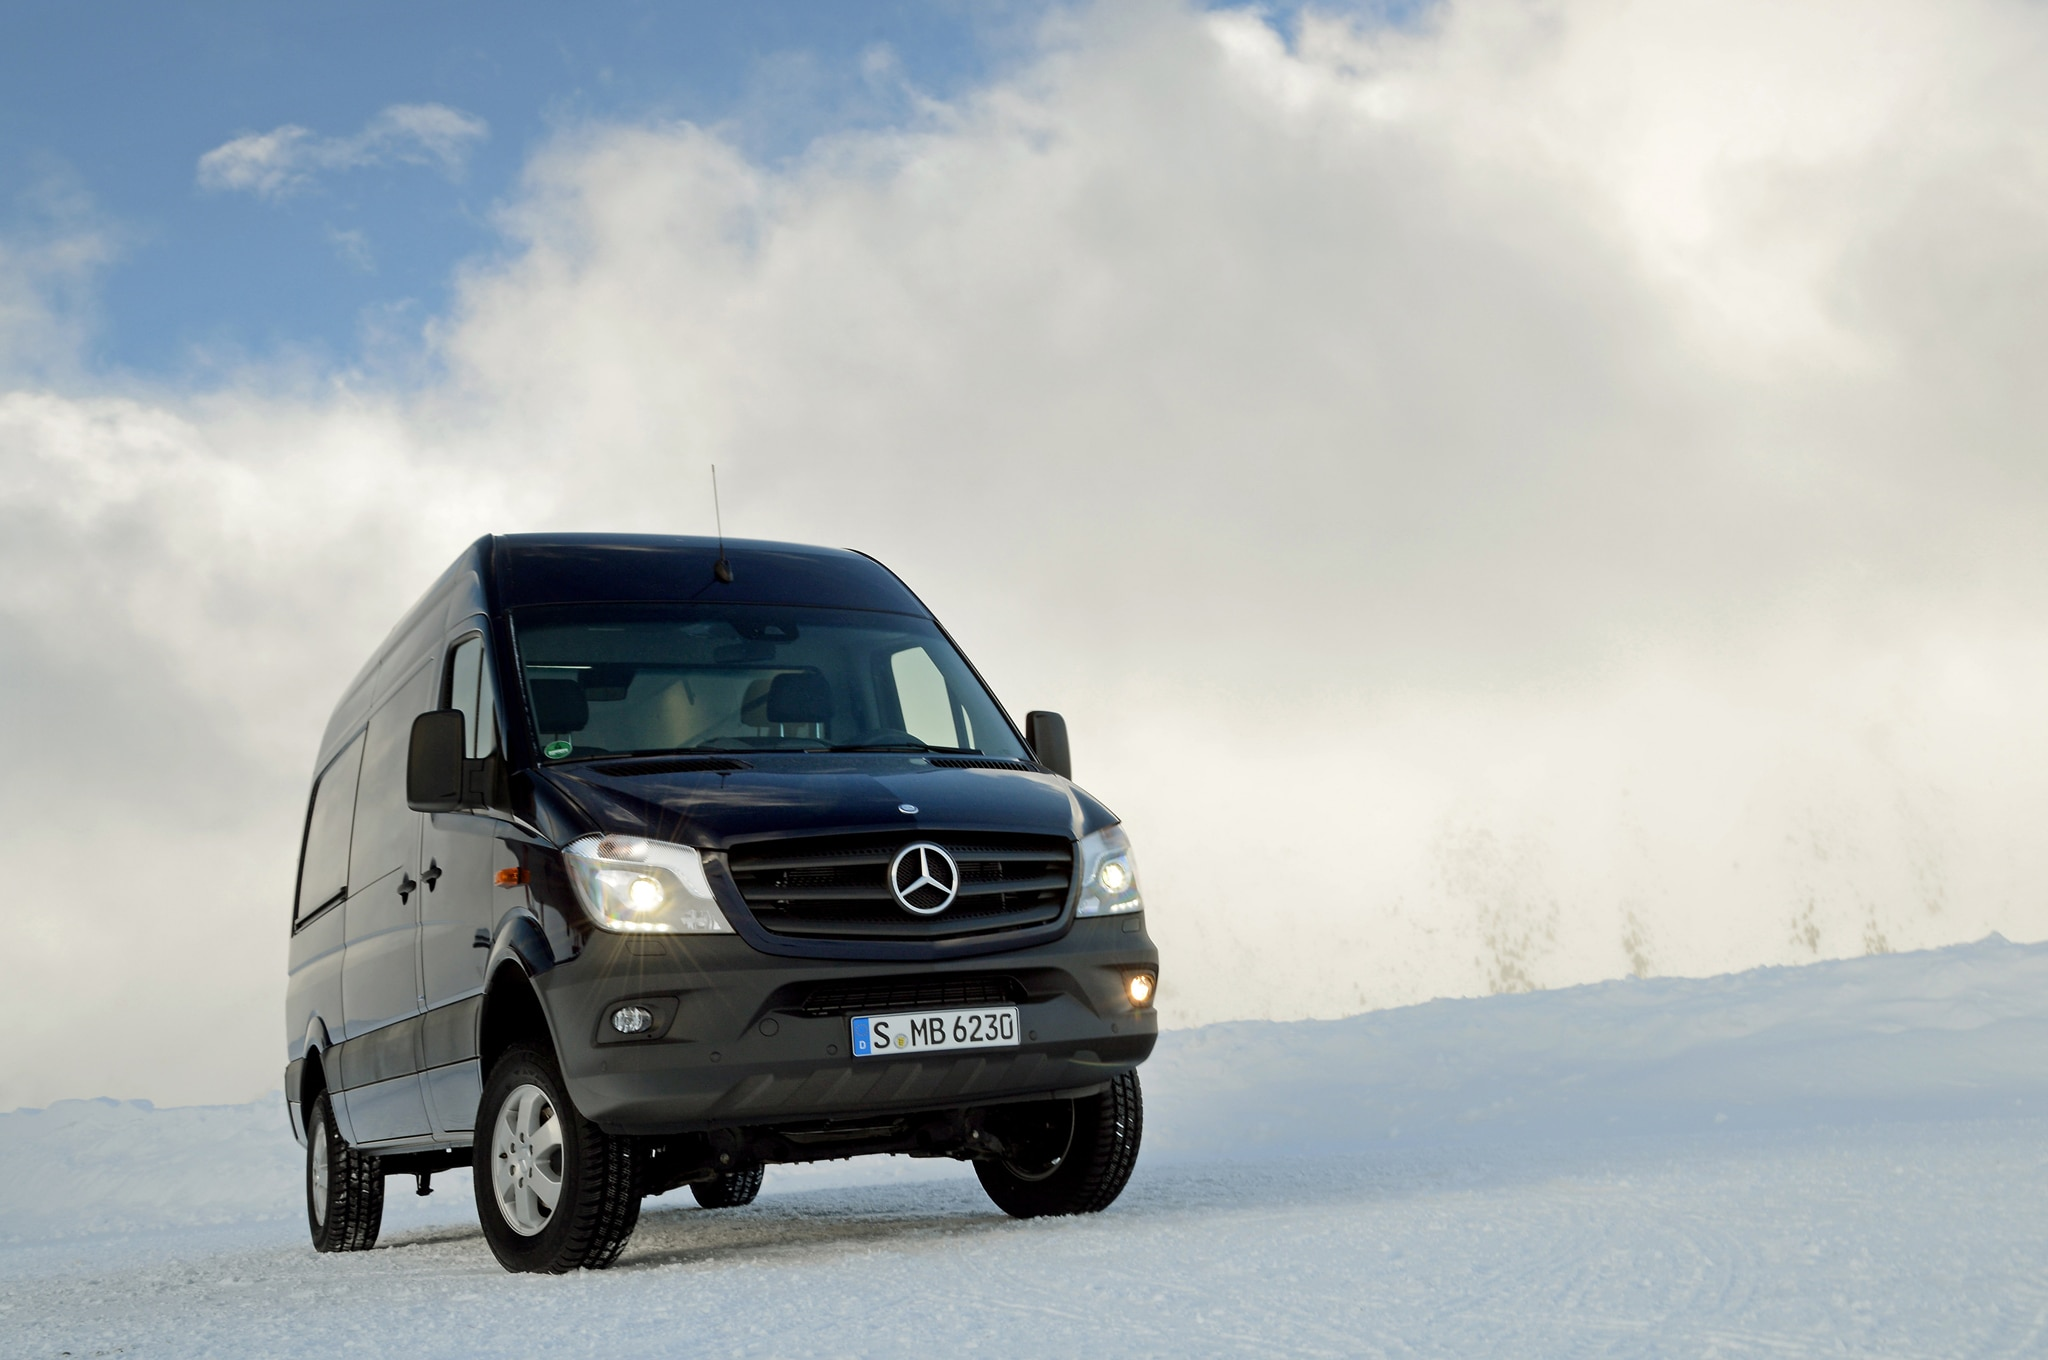 Mercedes benz sprinter 4x4 debuts in europe for Mercedes benz europe